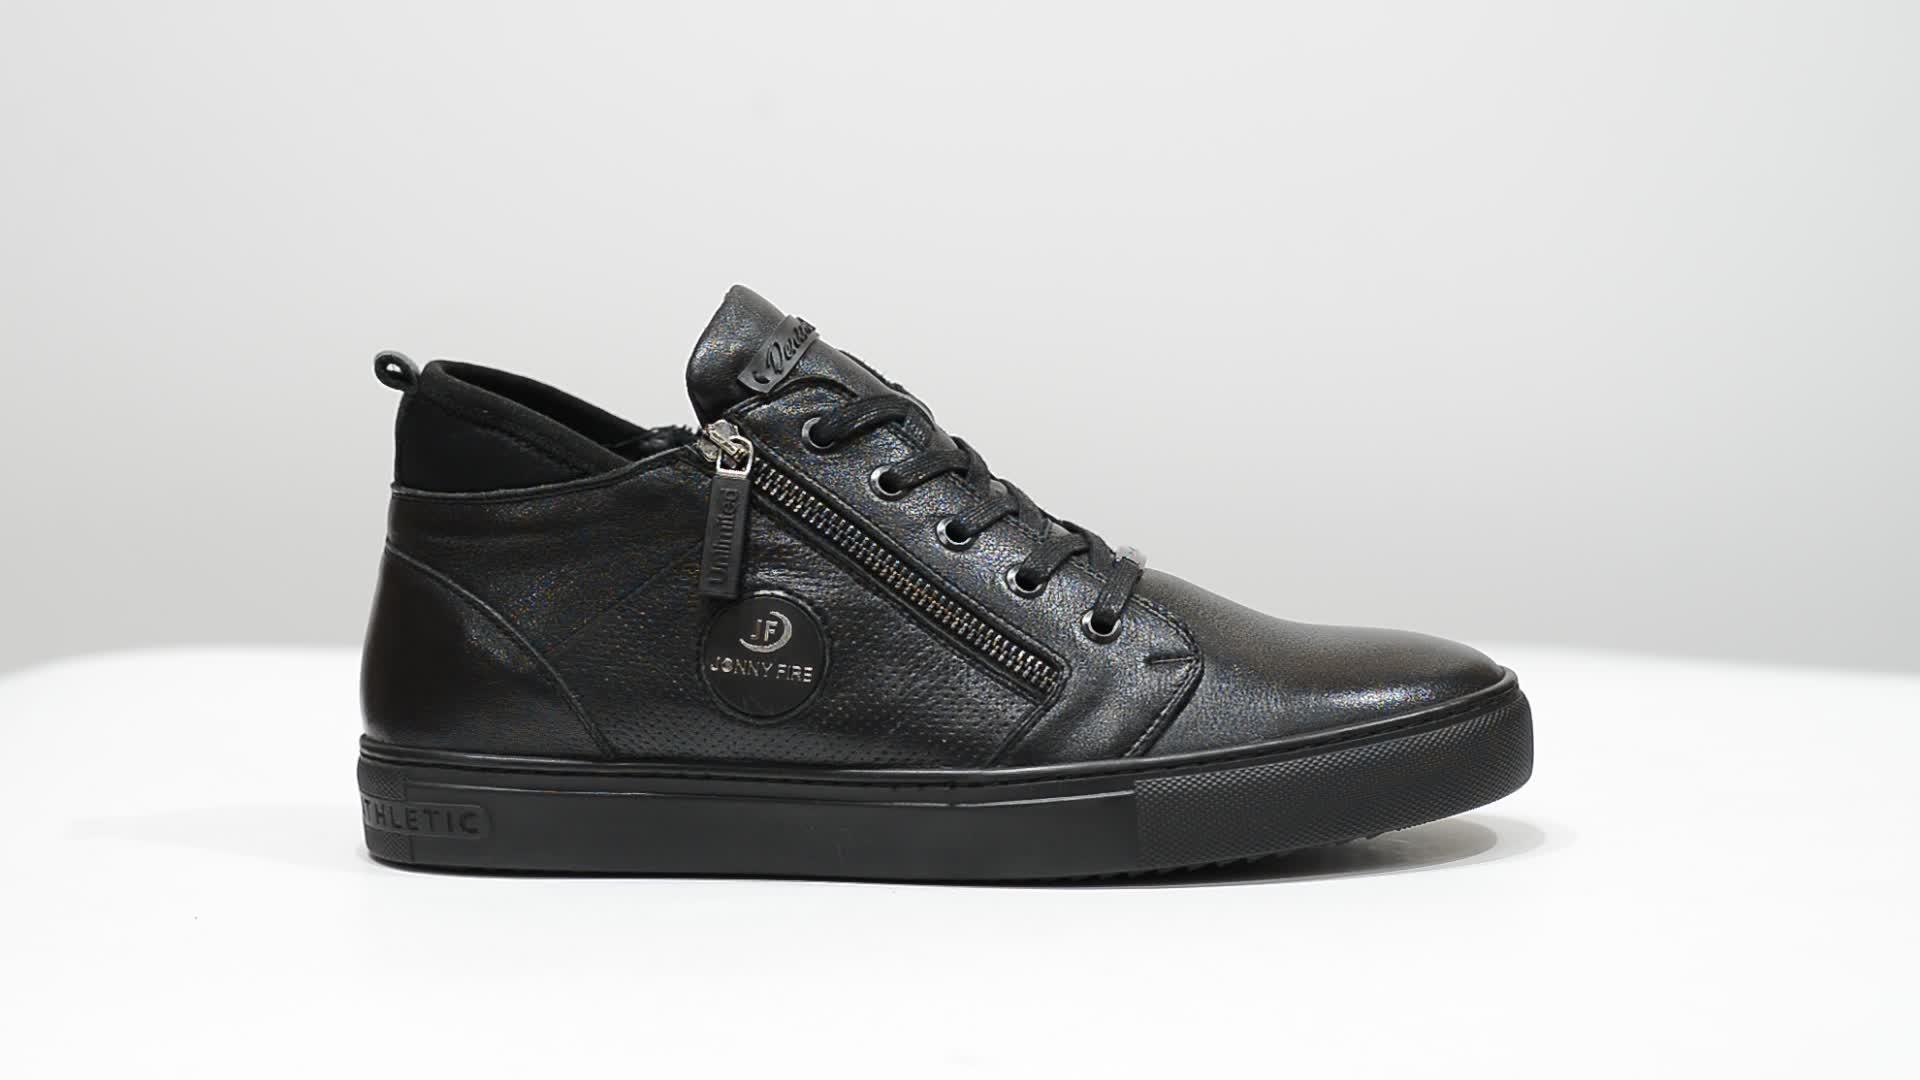 Men's winter shoes M837 chp